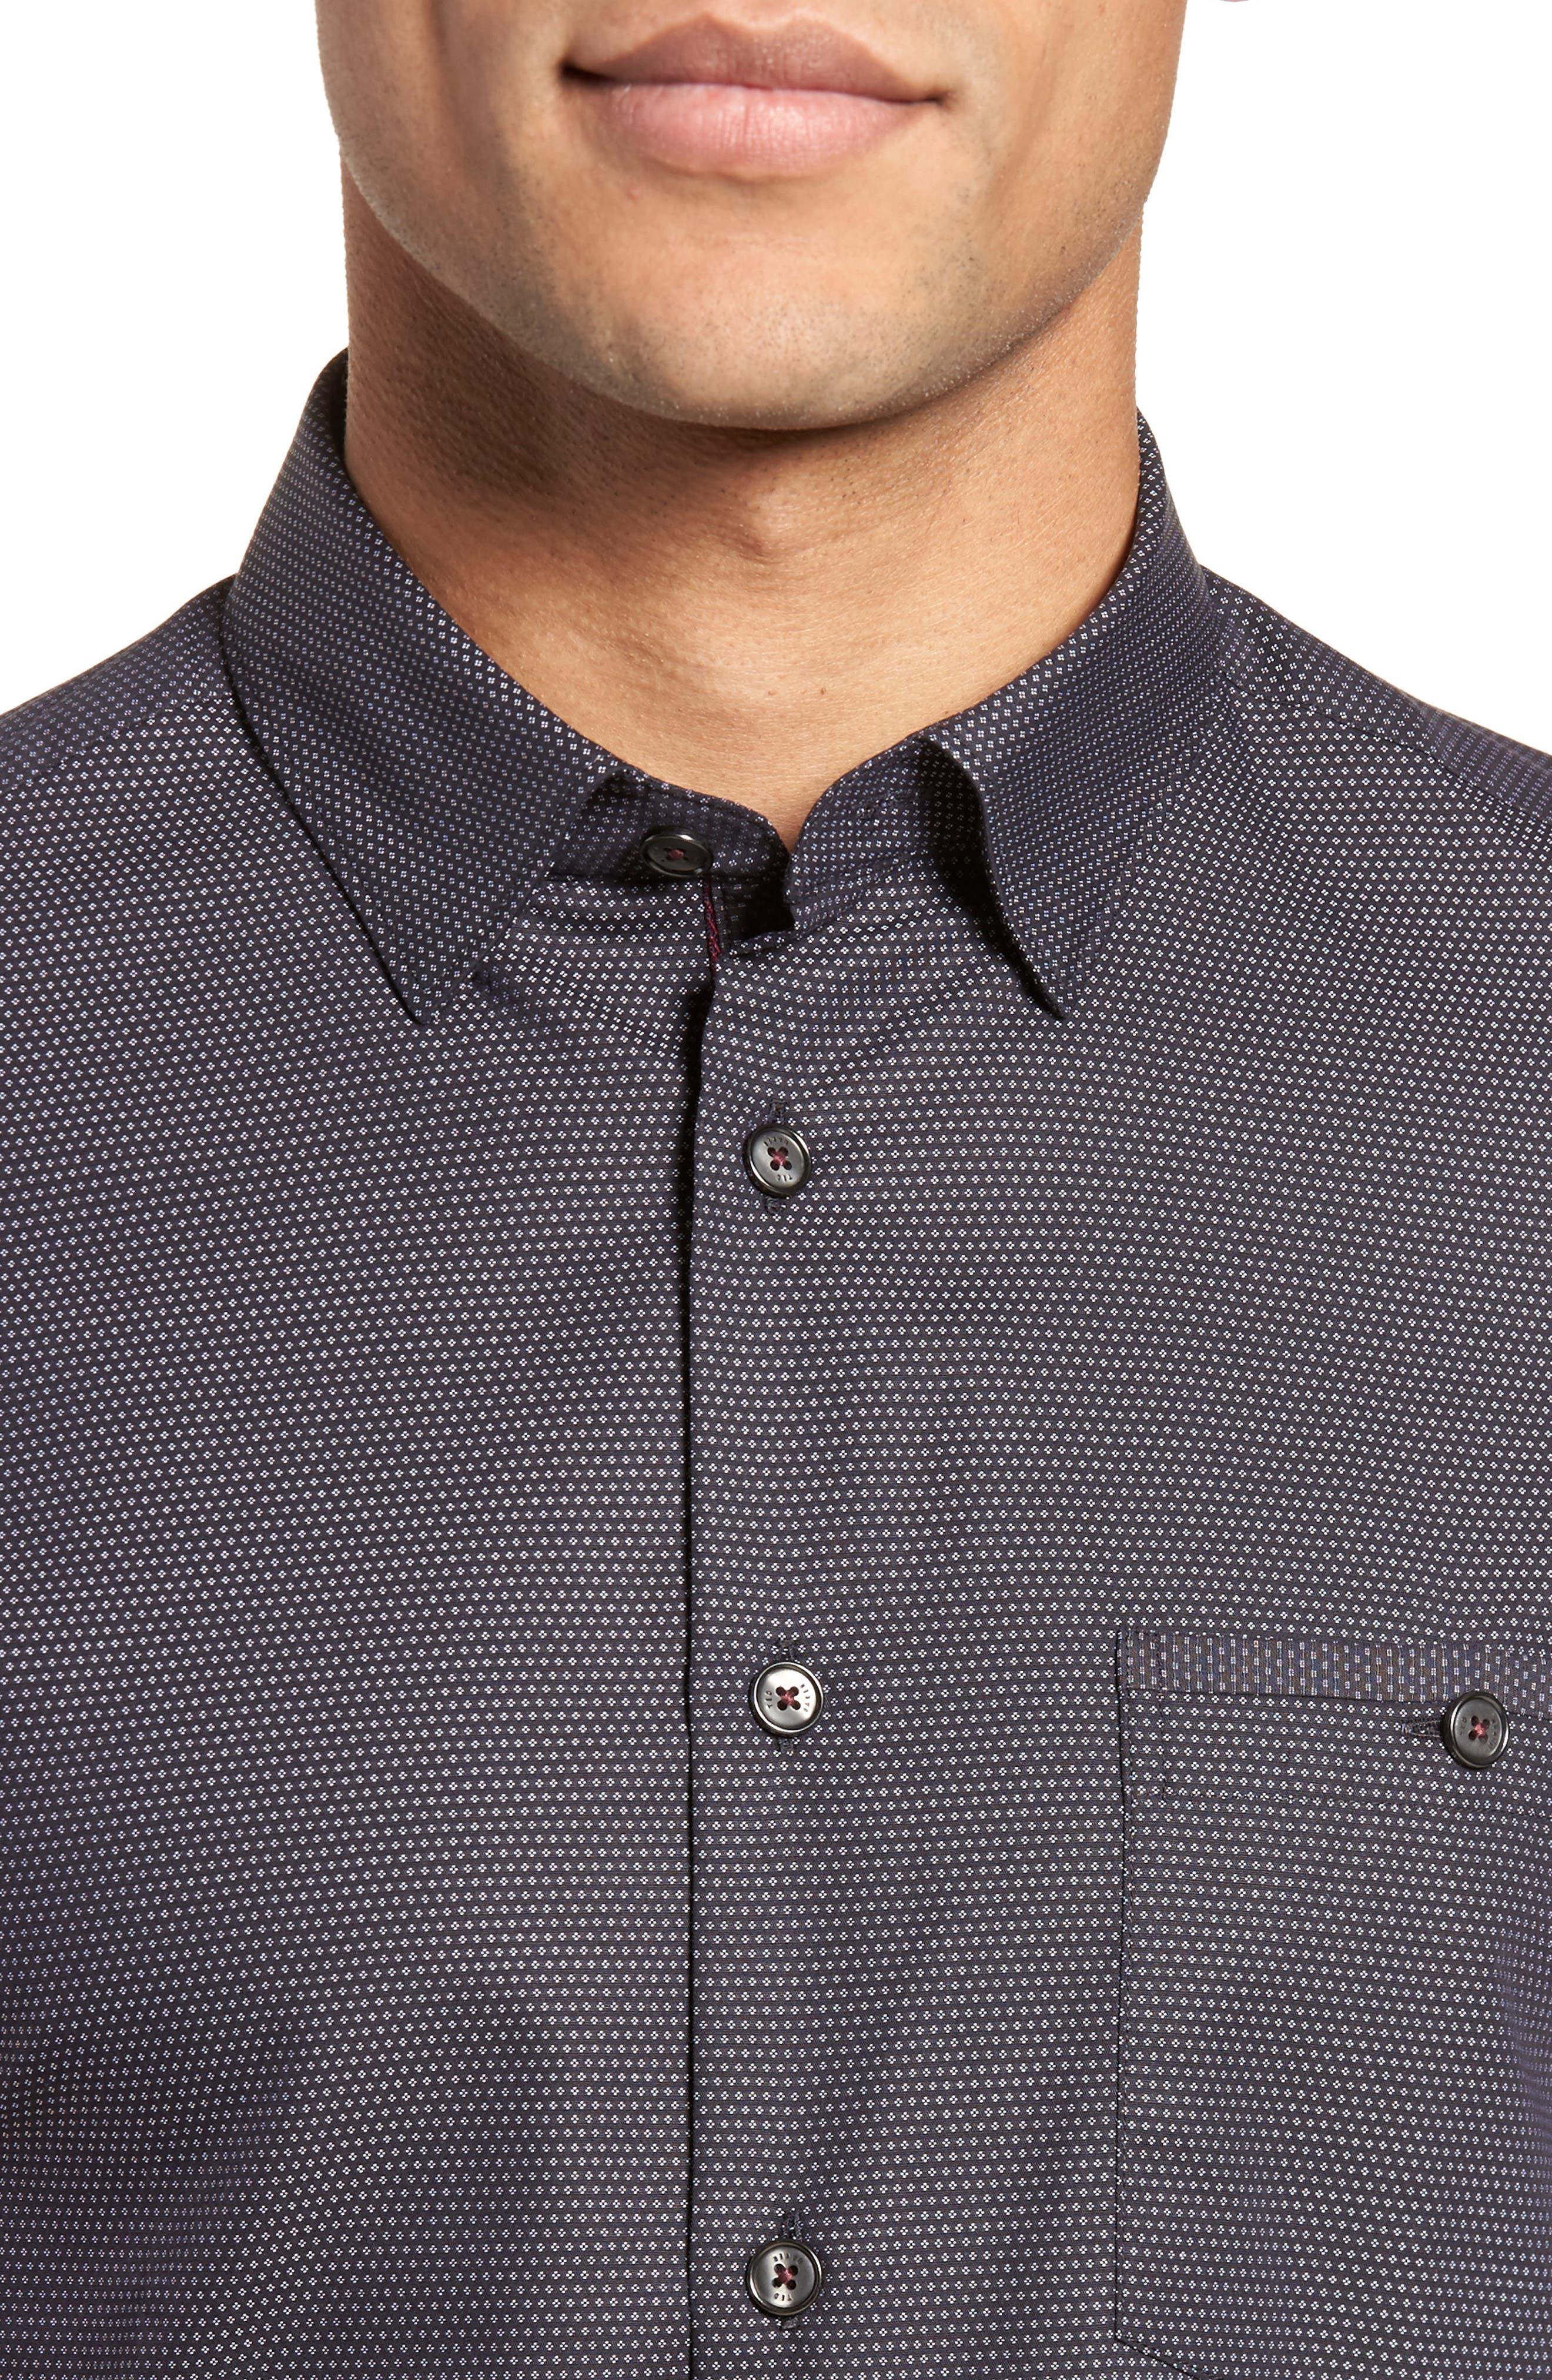 Dotdots Trim Fit Dot Short Sleeve Sport Shirt,                             Alternate thumbnail 4, color,                             001